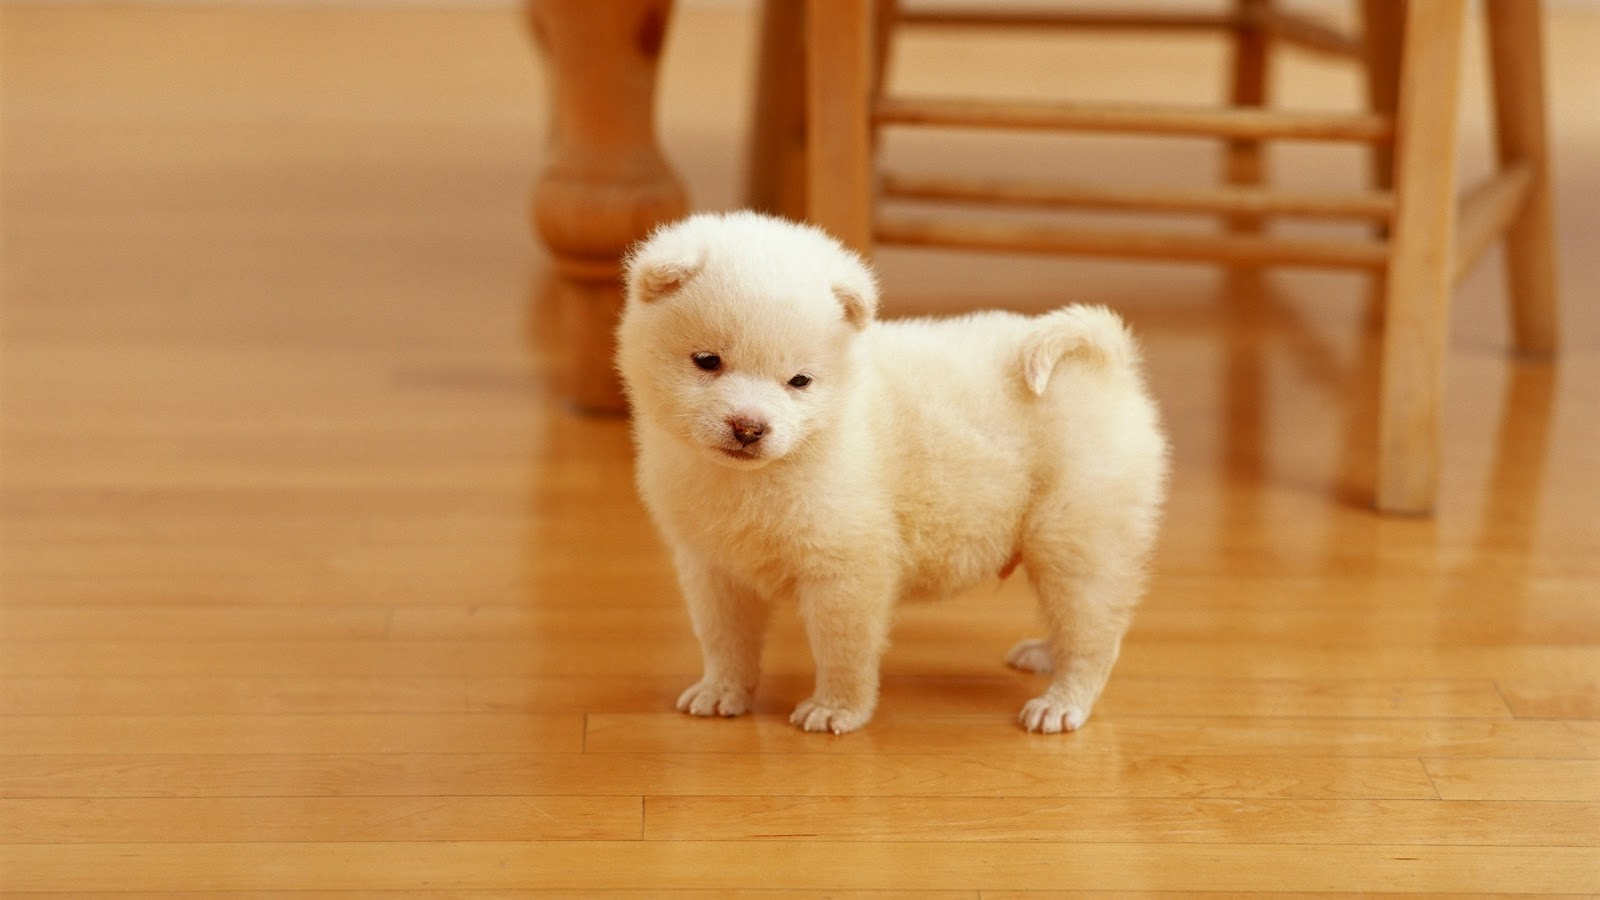 Cute White Puppy Desktop Wallpaper Windows 8 HD Wallpapers 1600x900